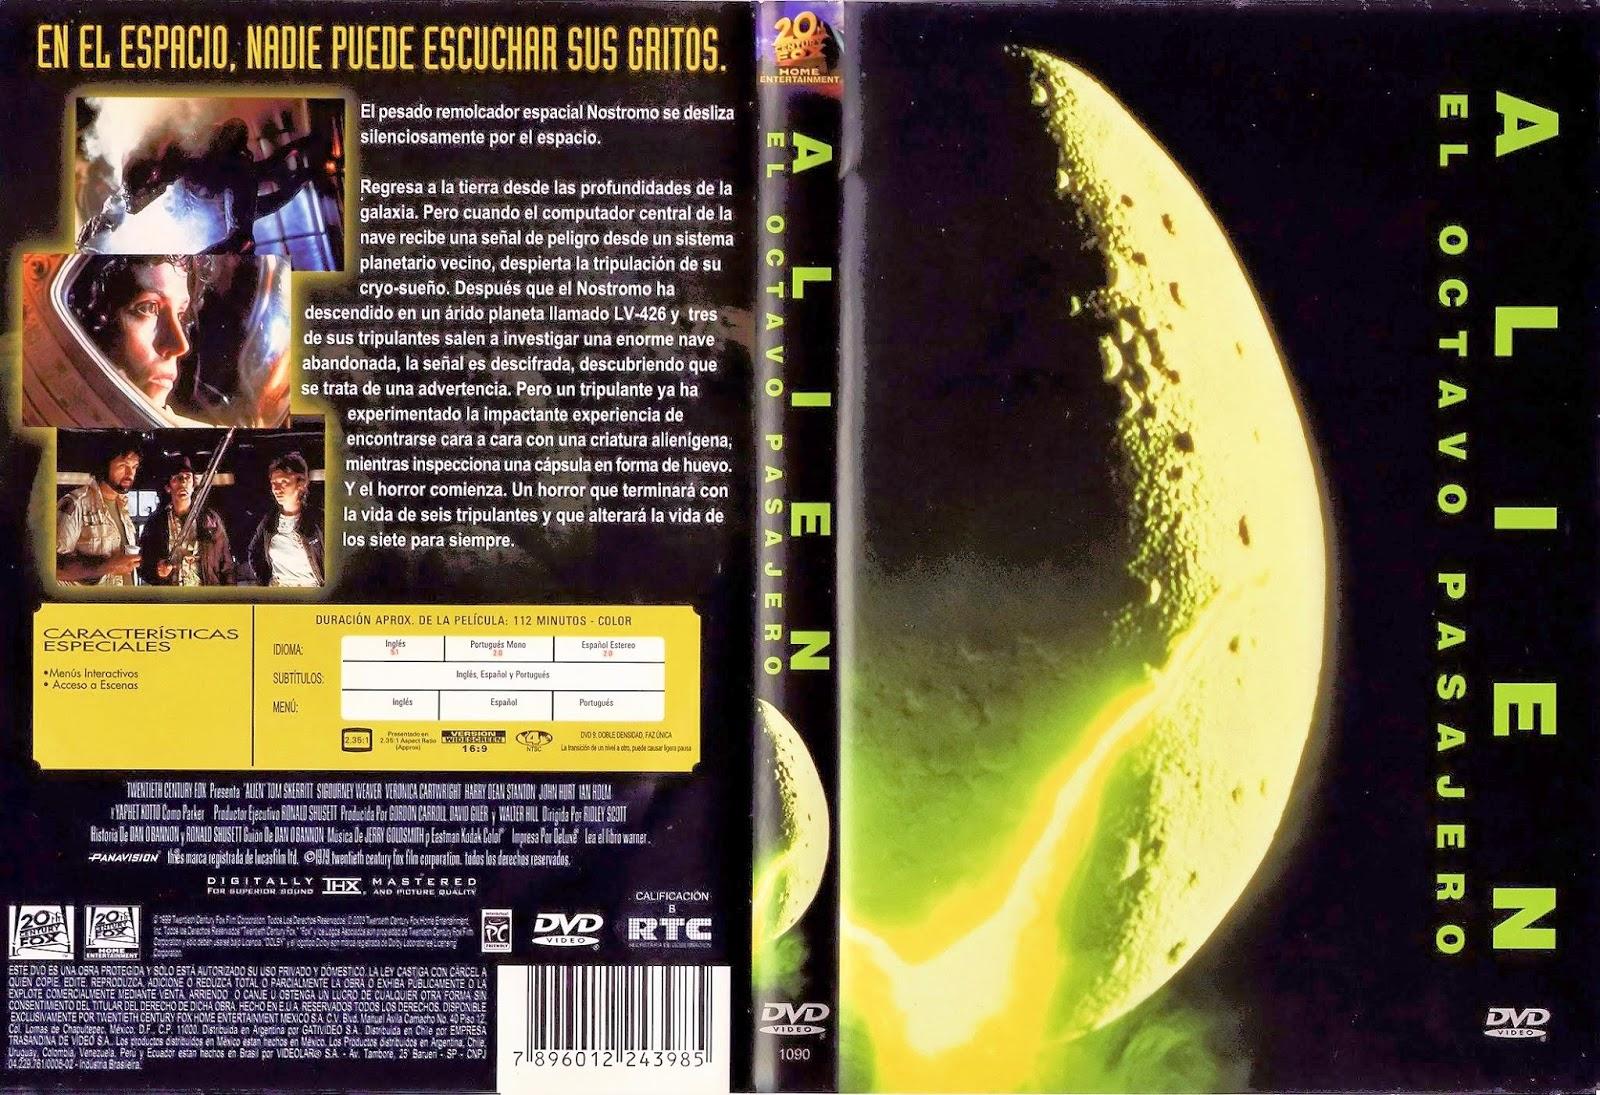 Alien El Octavo Pasajero DVD